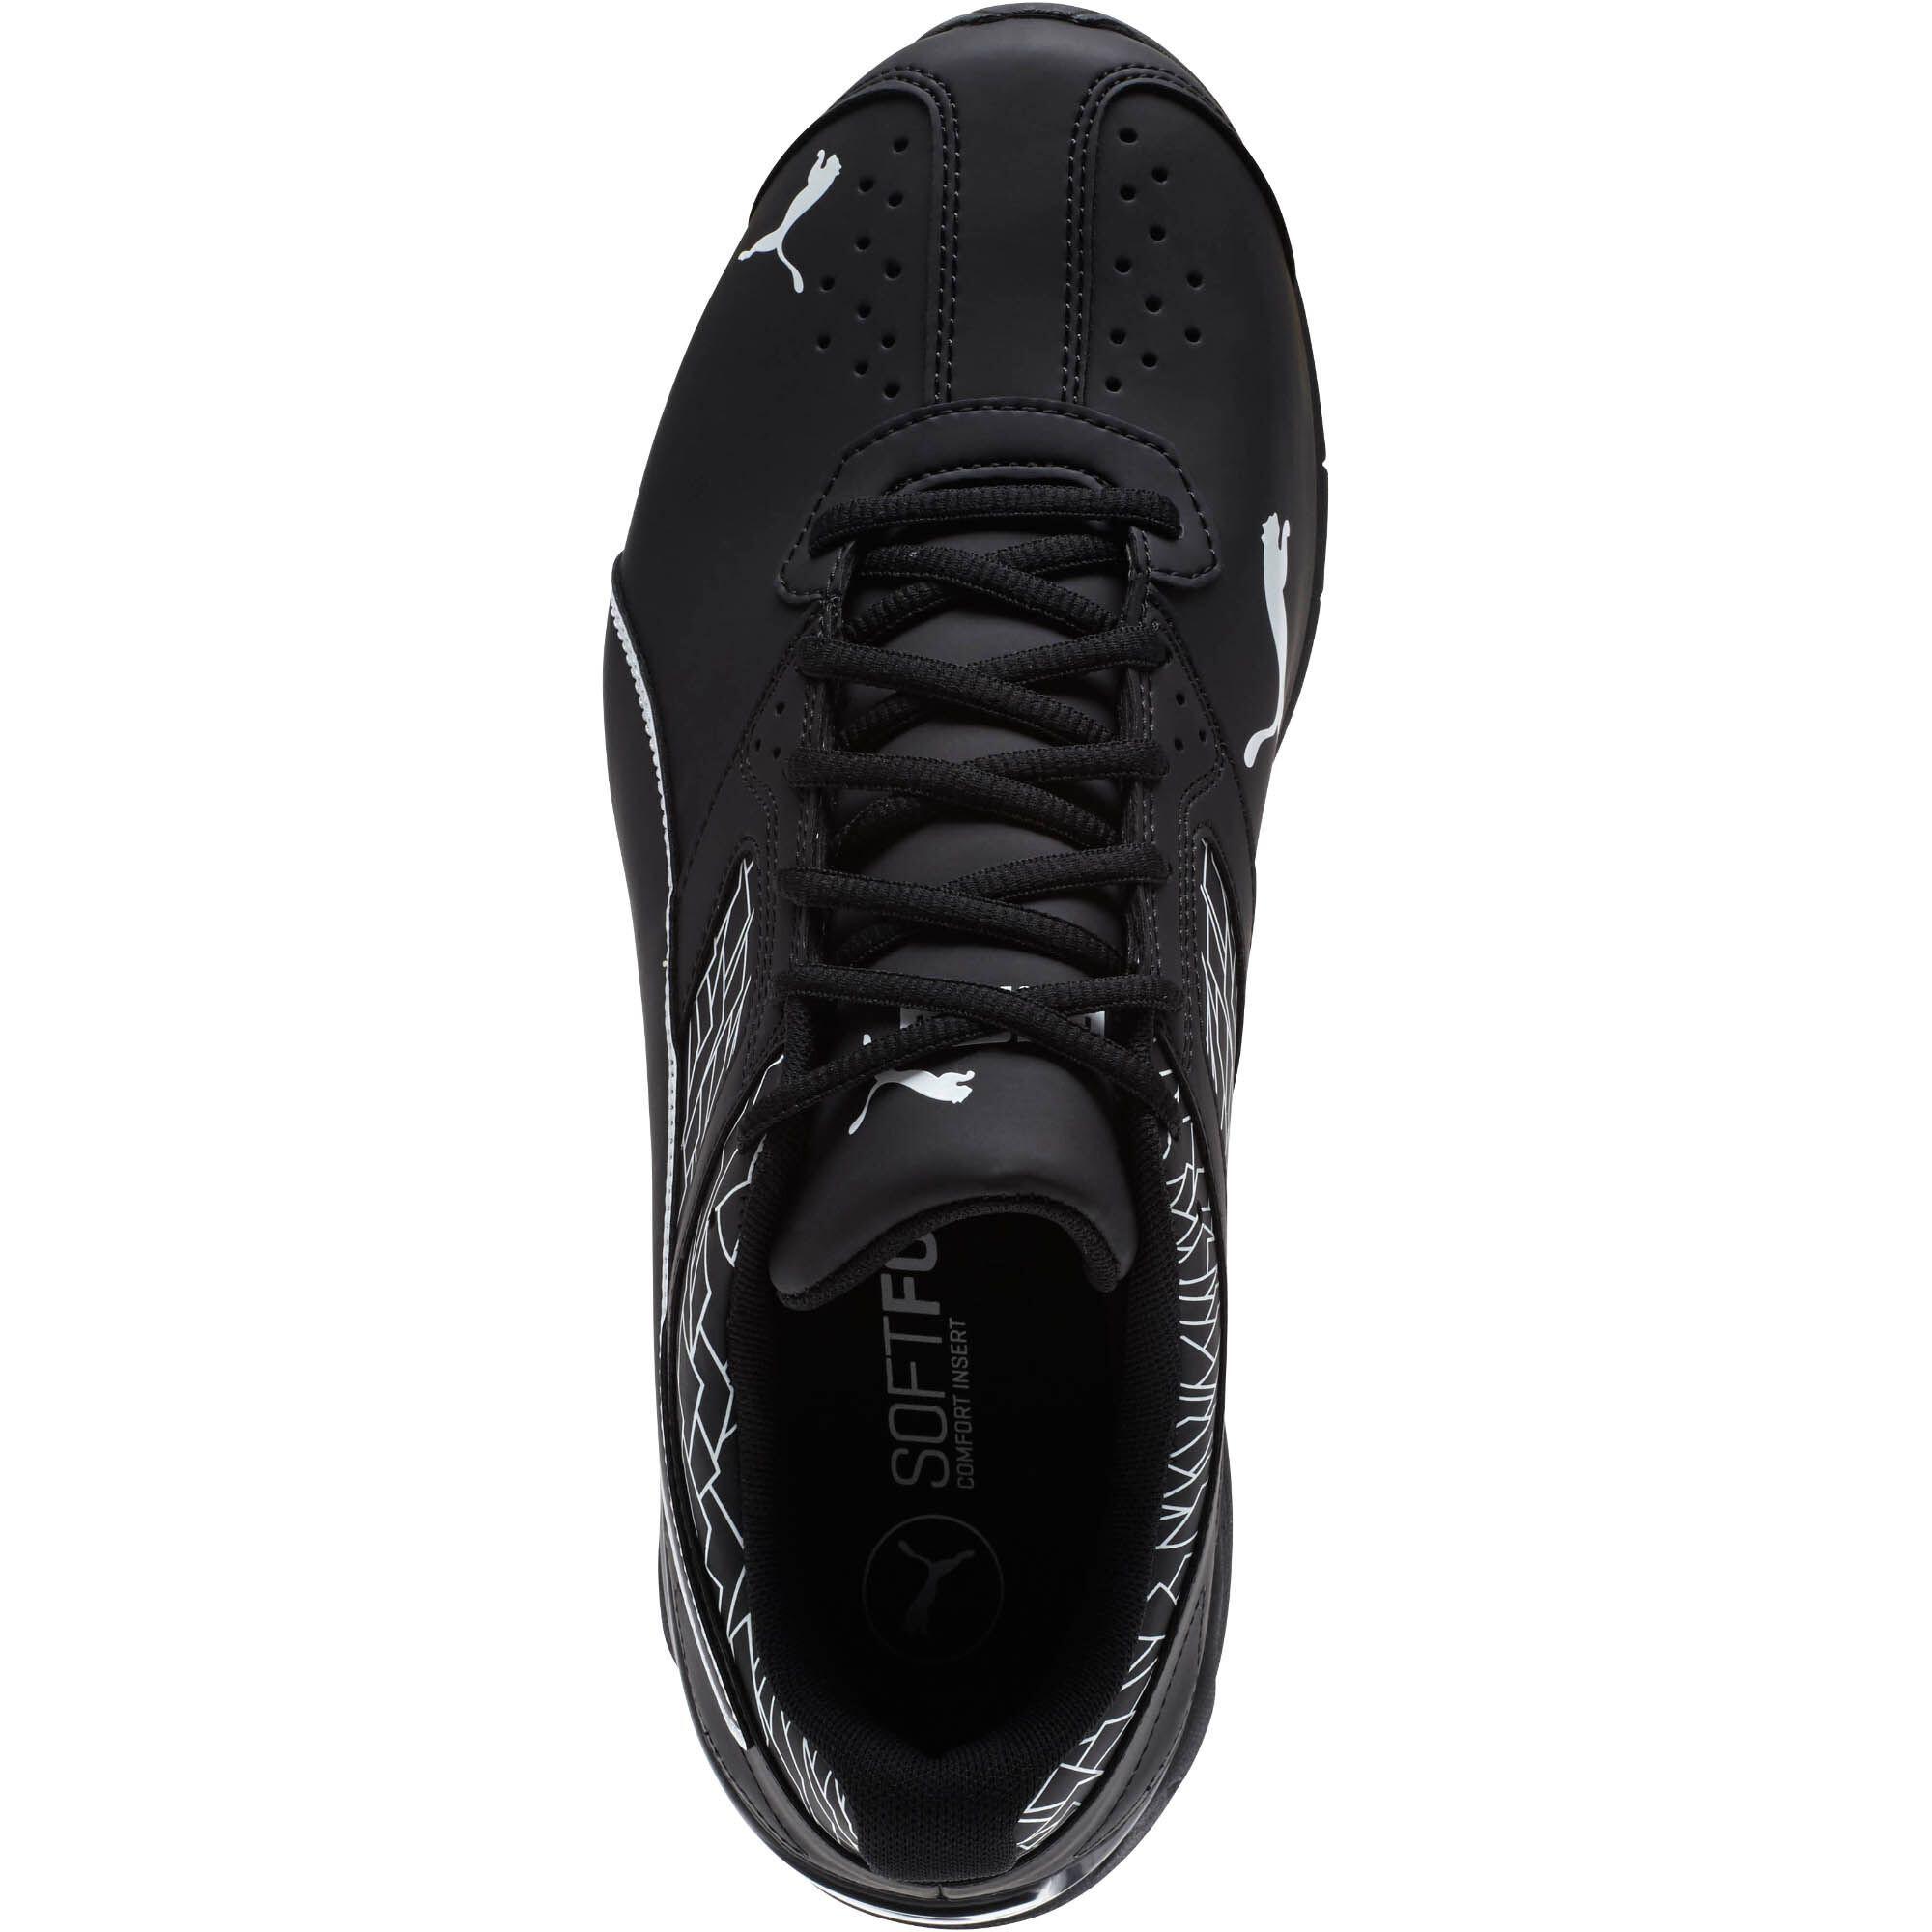 thumbnail 15 - PUMA Men's Tazon 6 Fracture FM Sneakers